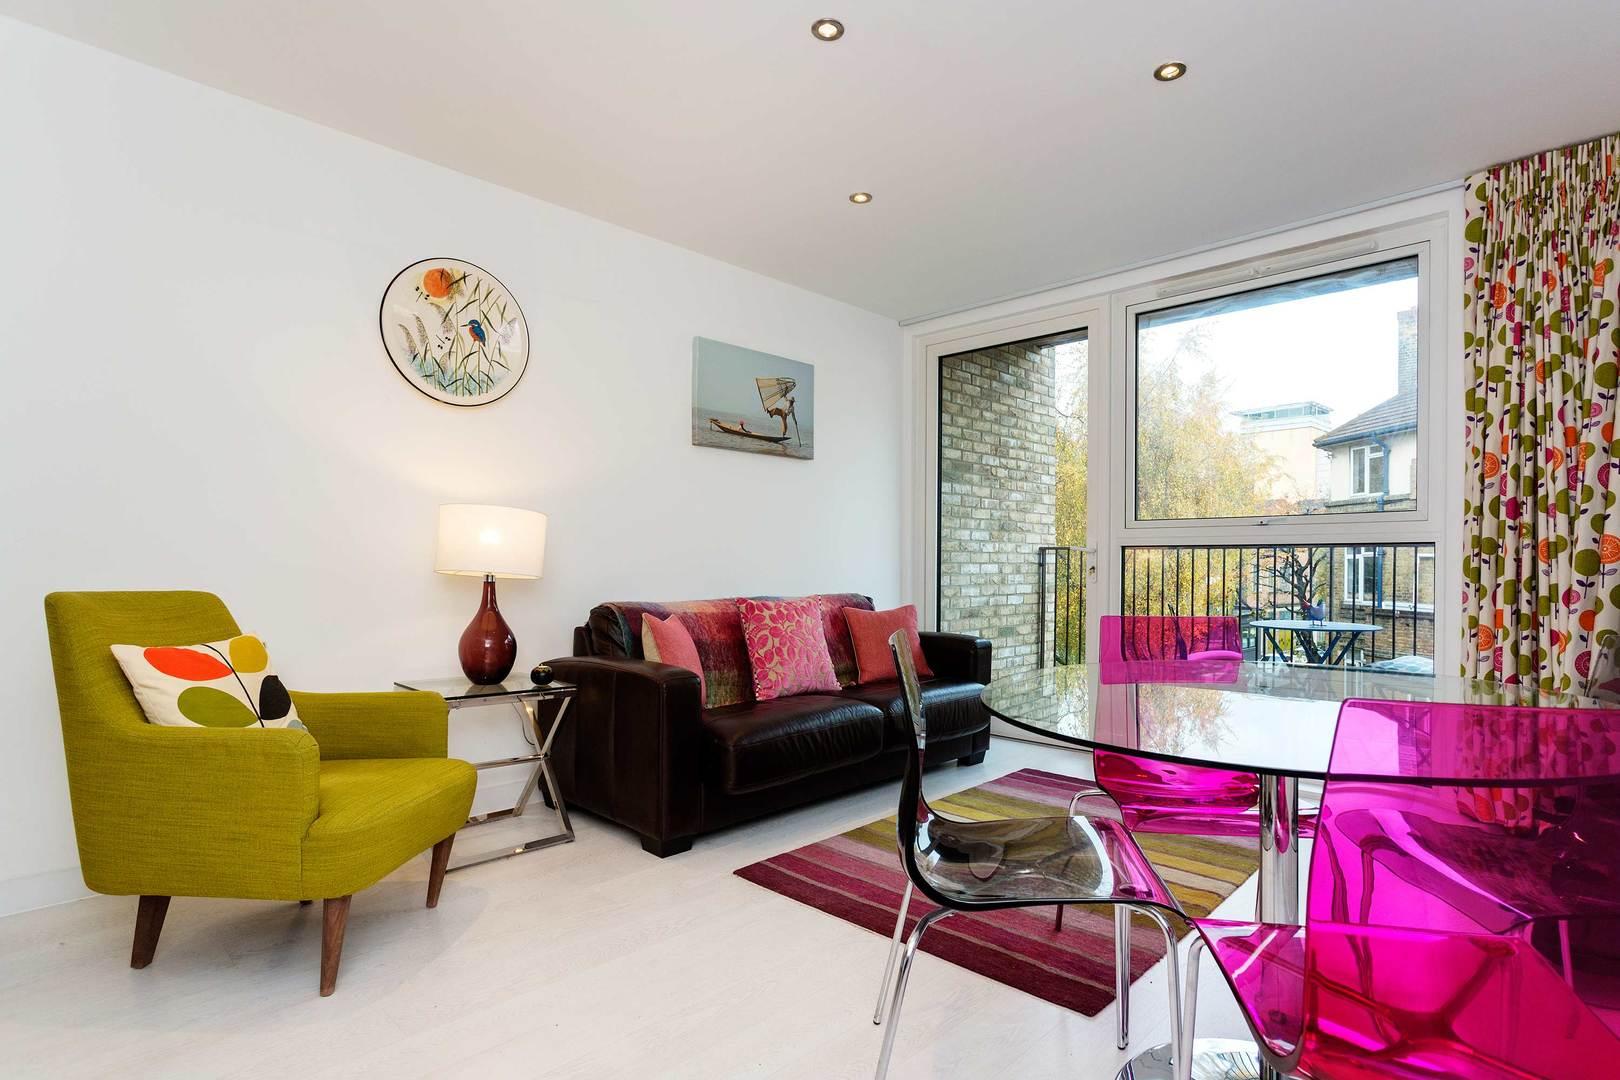 007 skyliner 1 bed apartment in london bridge u2022 veeve rh veeve com